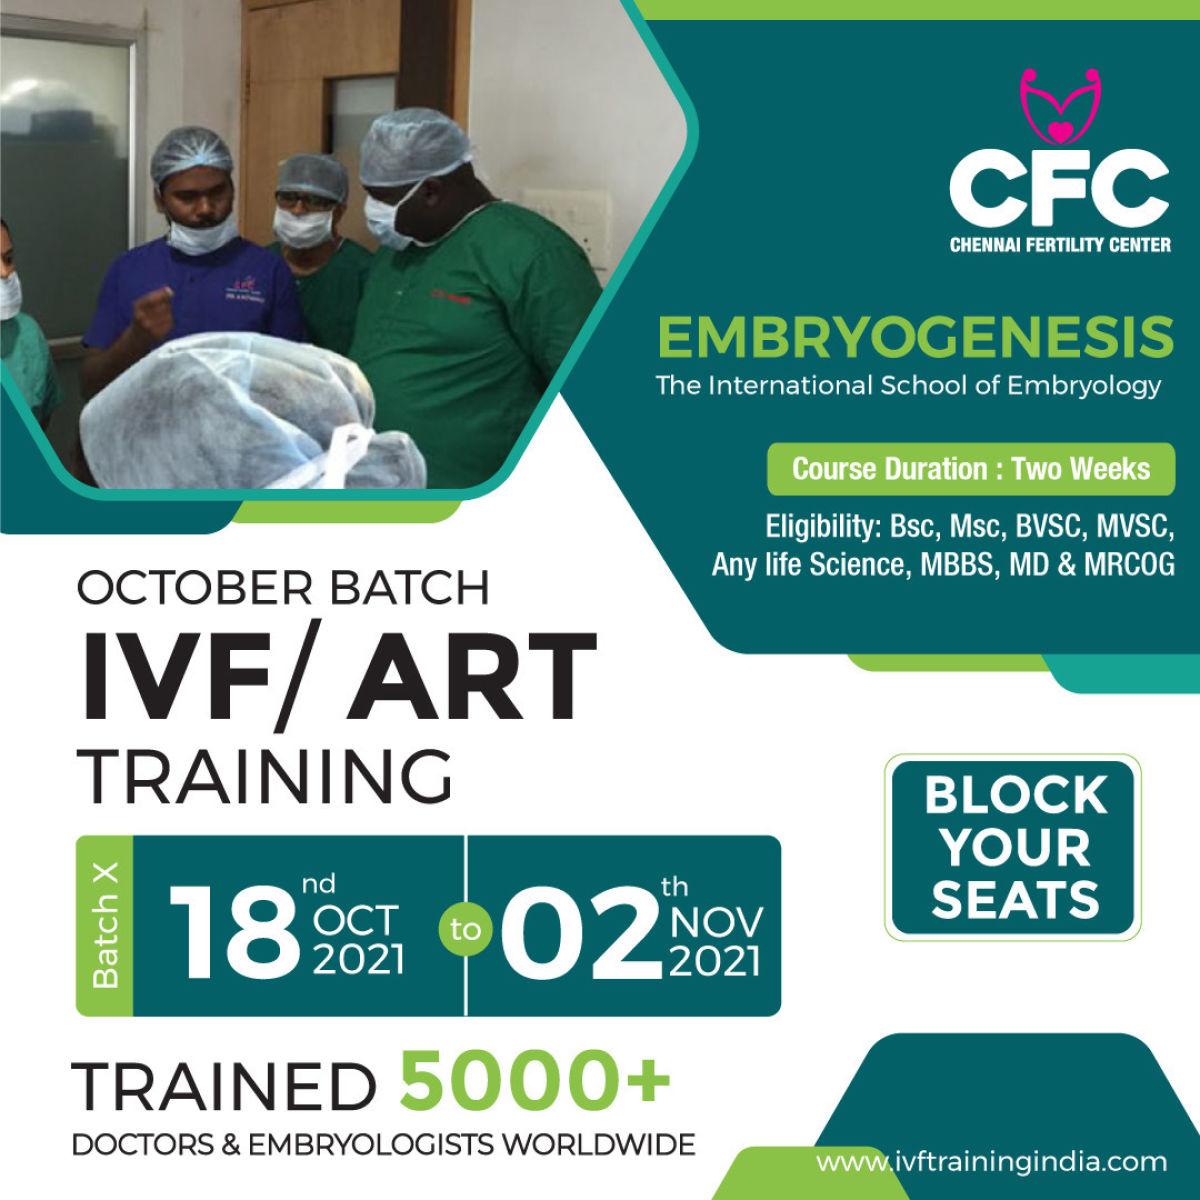 ART & Embryology training program